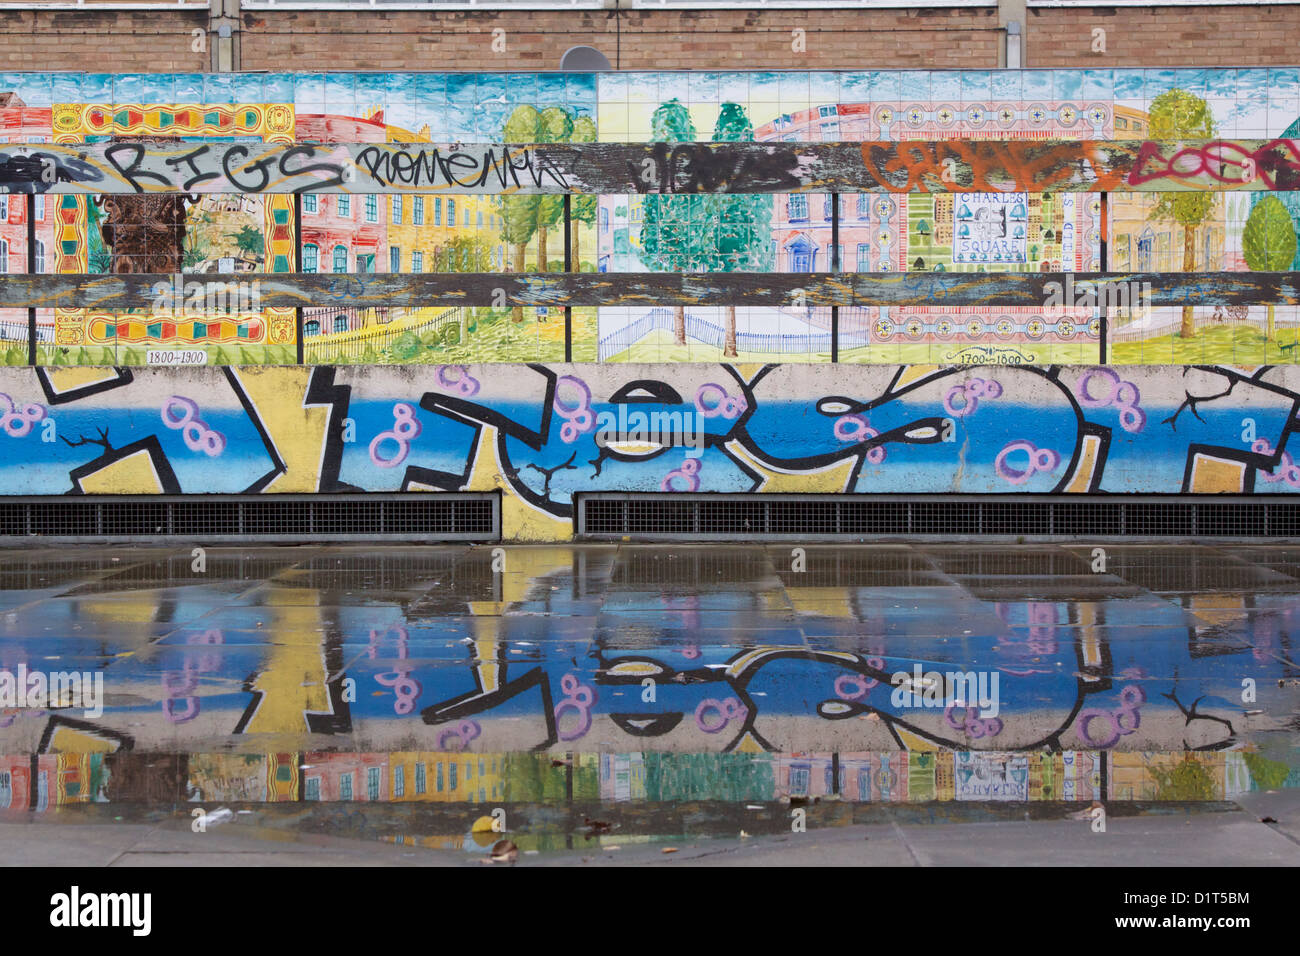 Graffiti wall uk - Graffiti Wall In Old Street East London England Uk